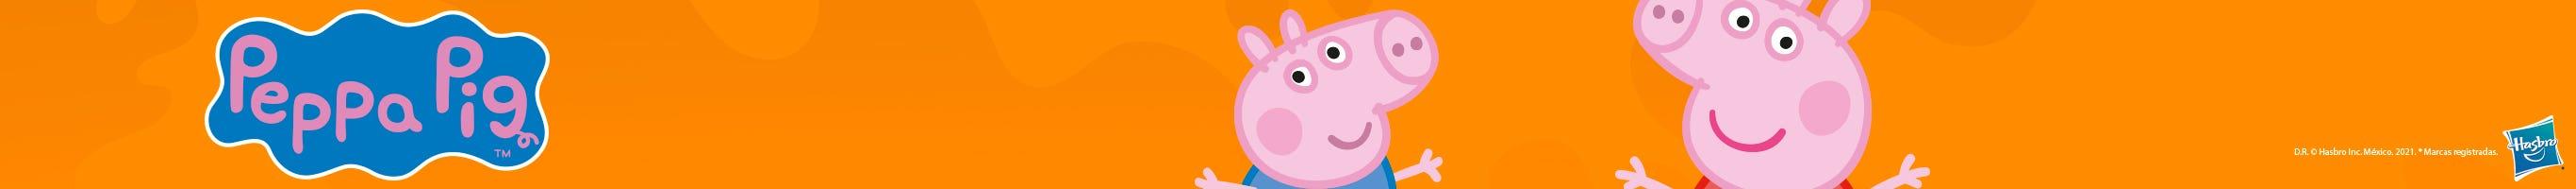 Hasbro Peppa Pig